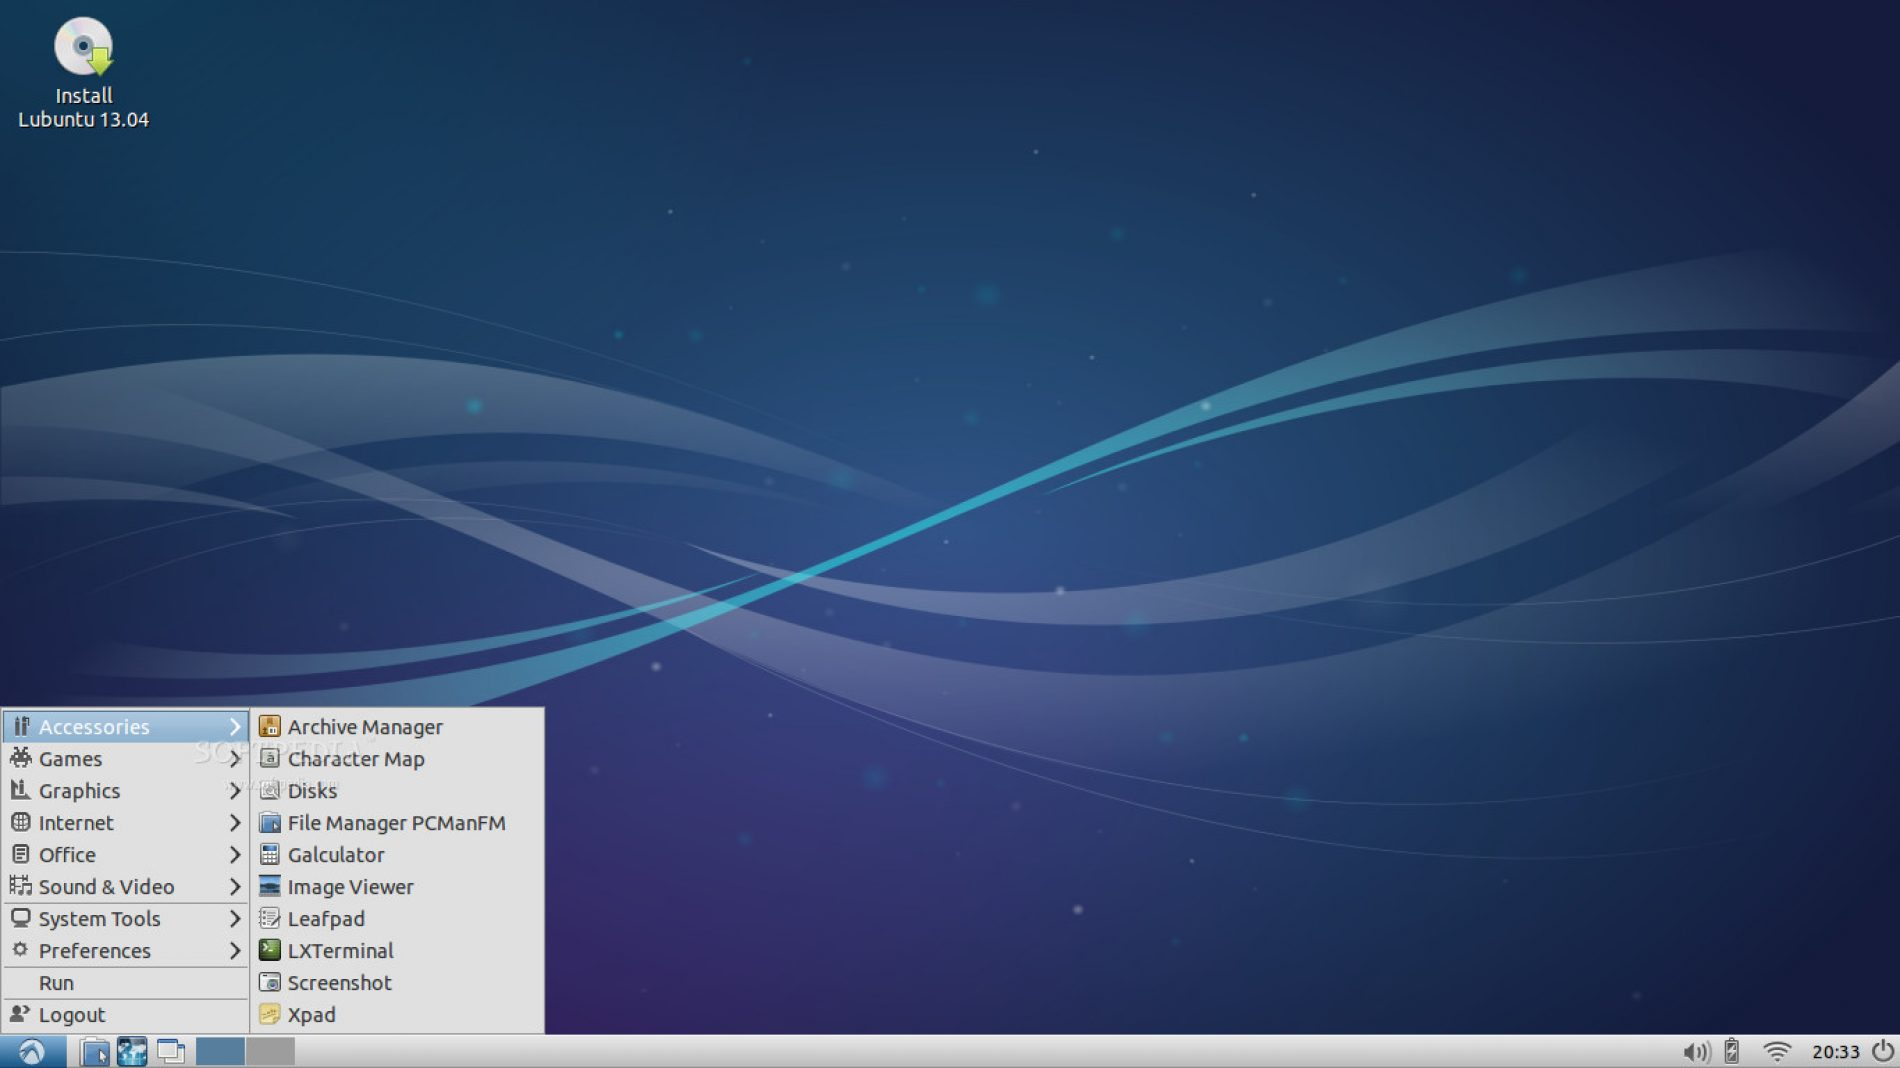 ¡Lubuntu 13.04 liberada! Instala tu Linux Superligero desde Pendrive